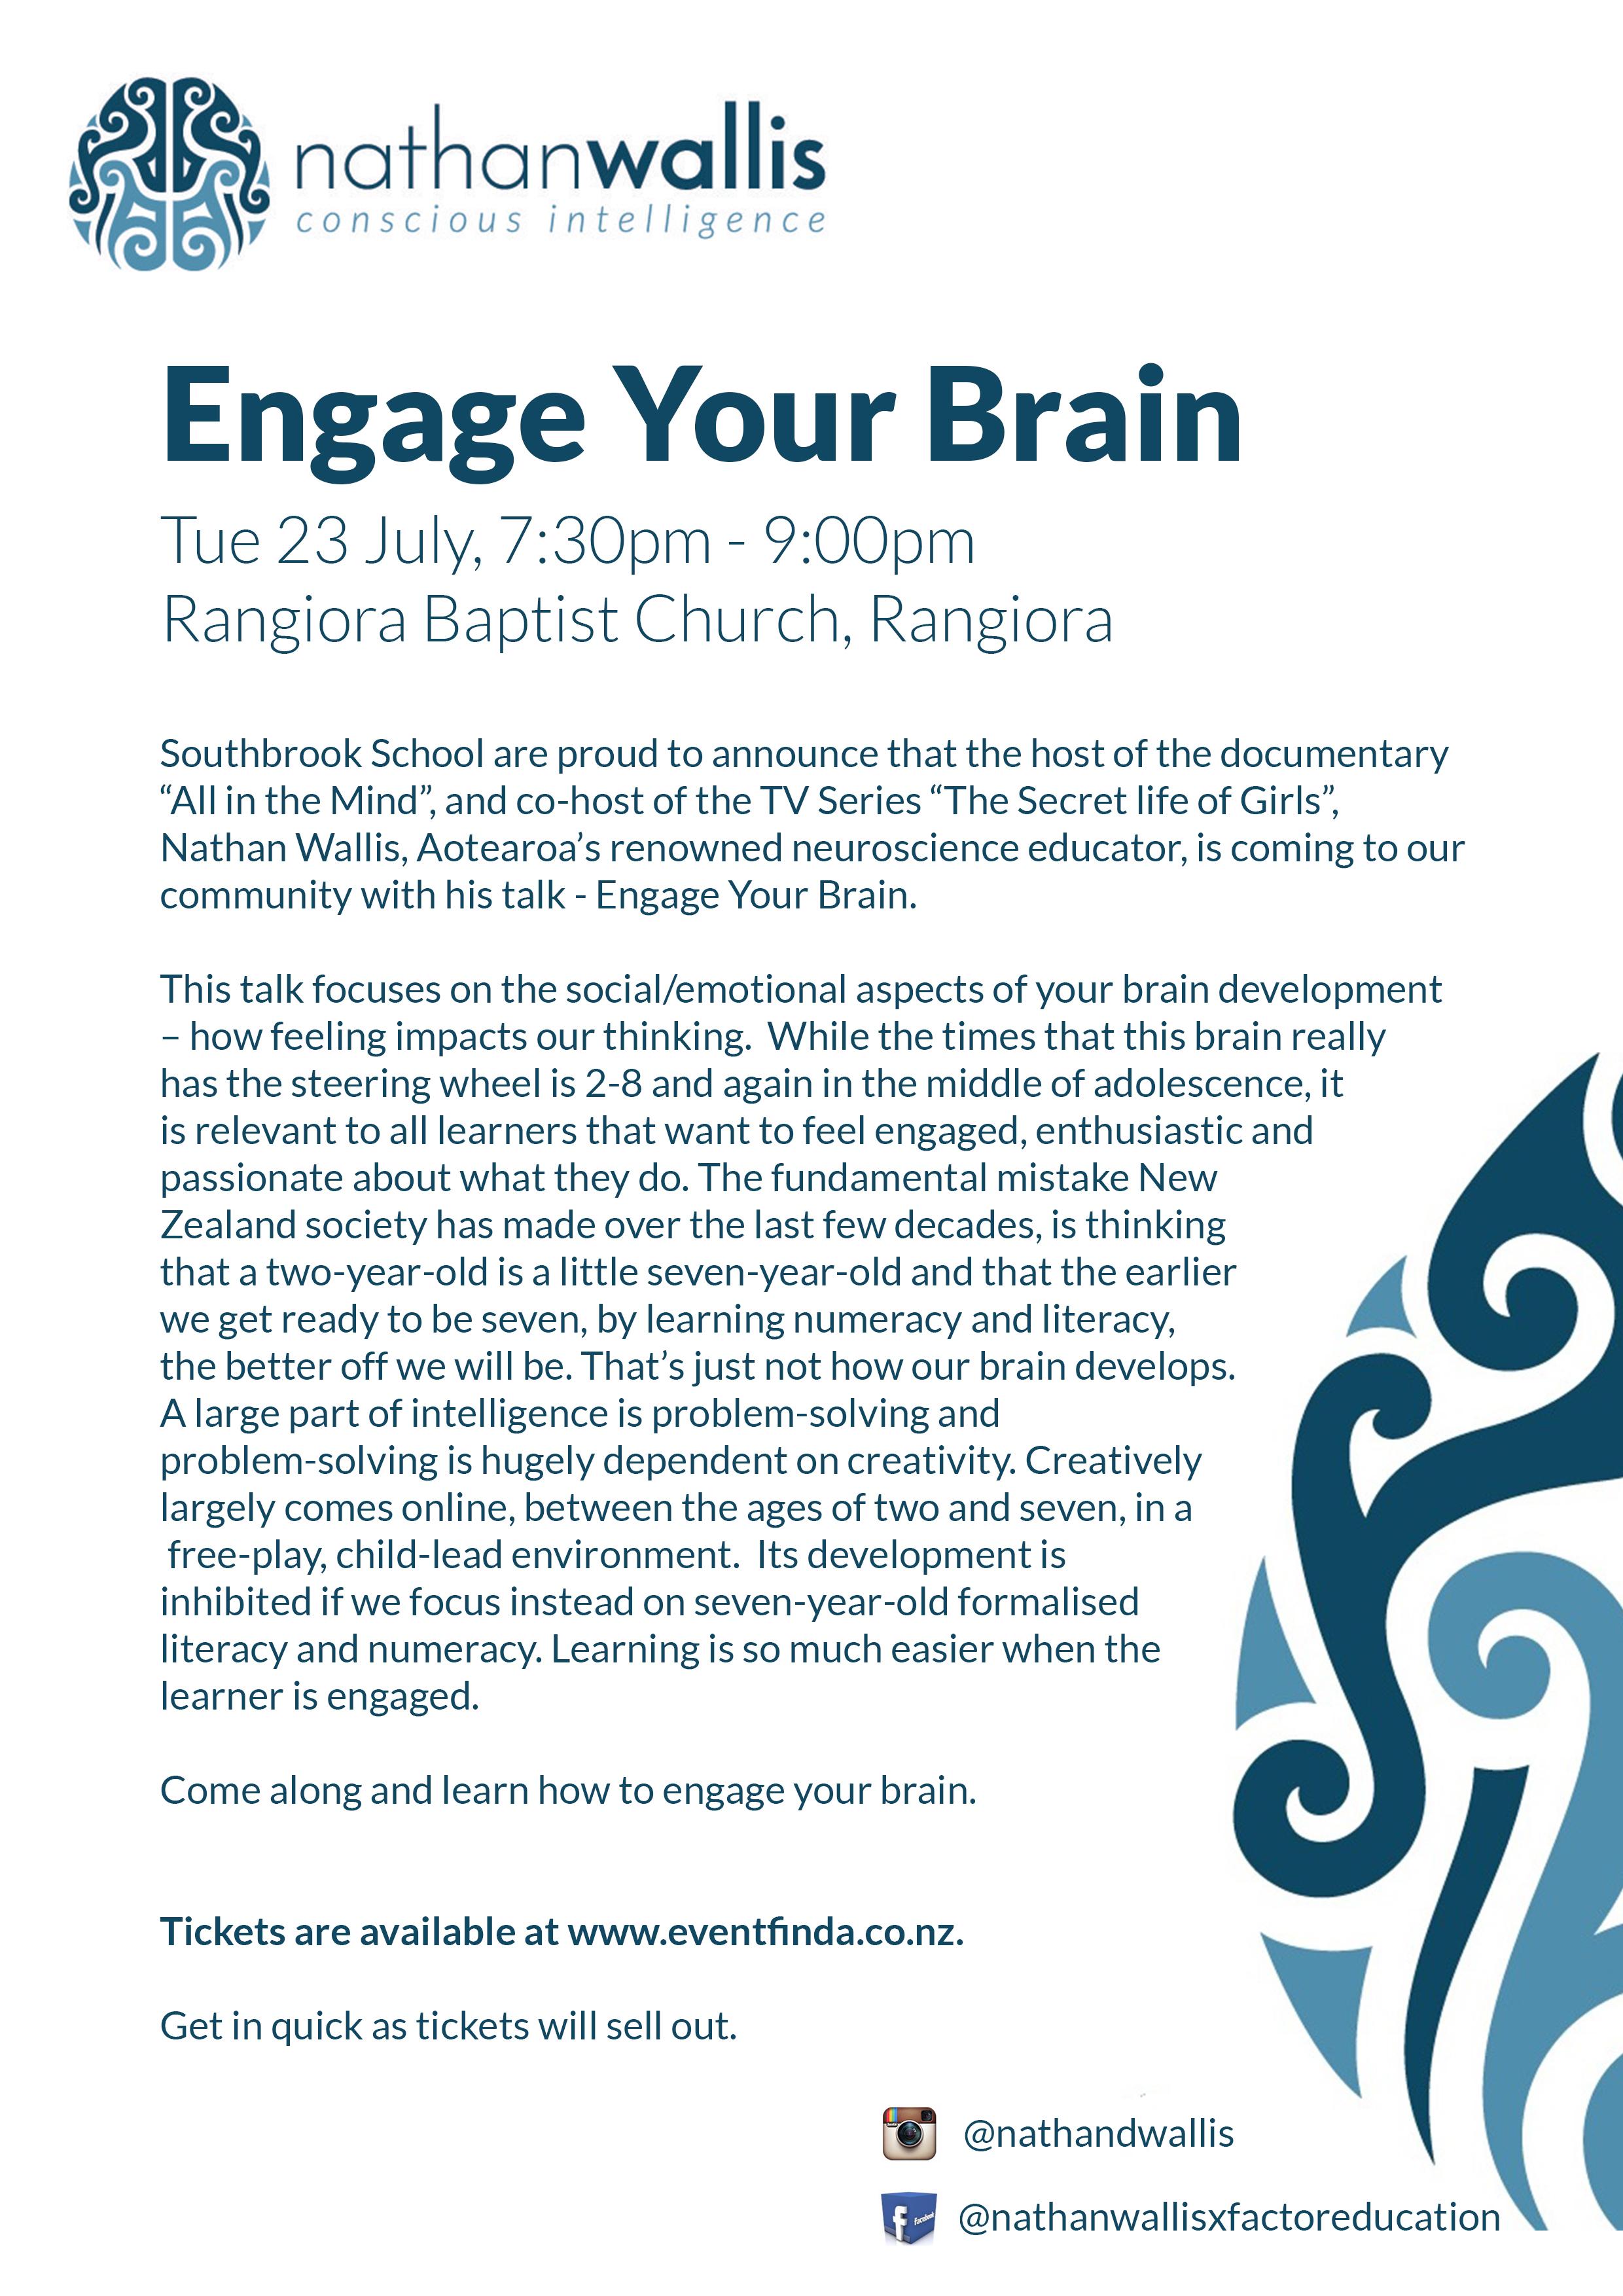 Engage Your Brain - Newsletter Flyer - Rangiora.jpg